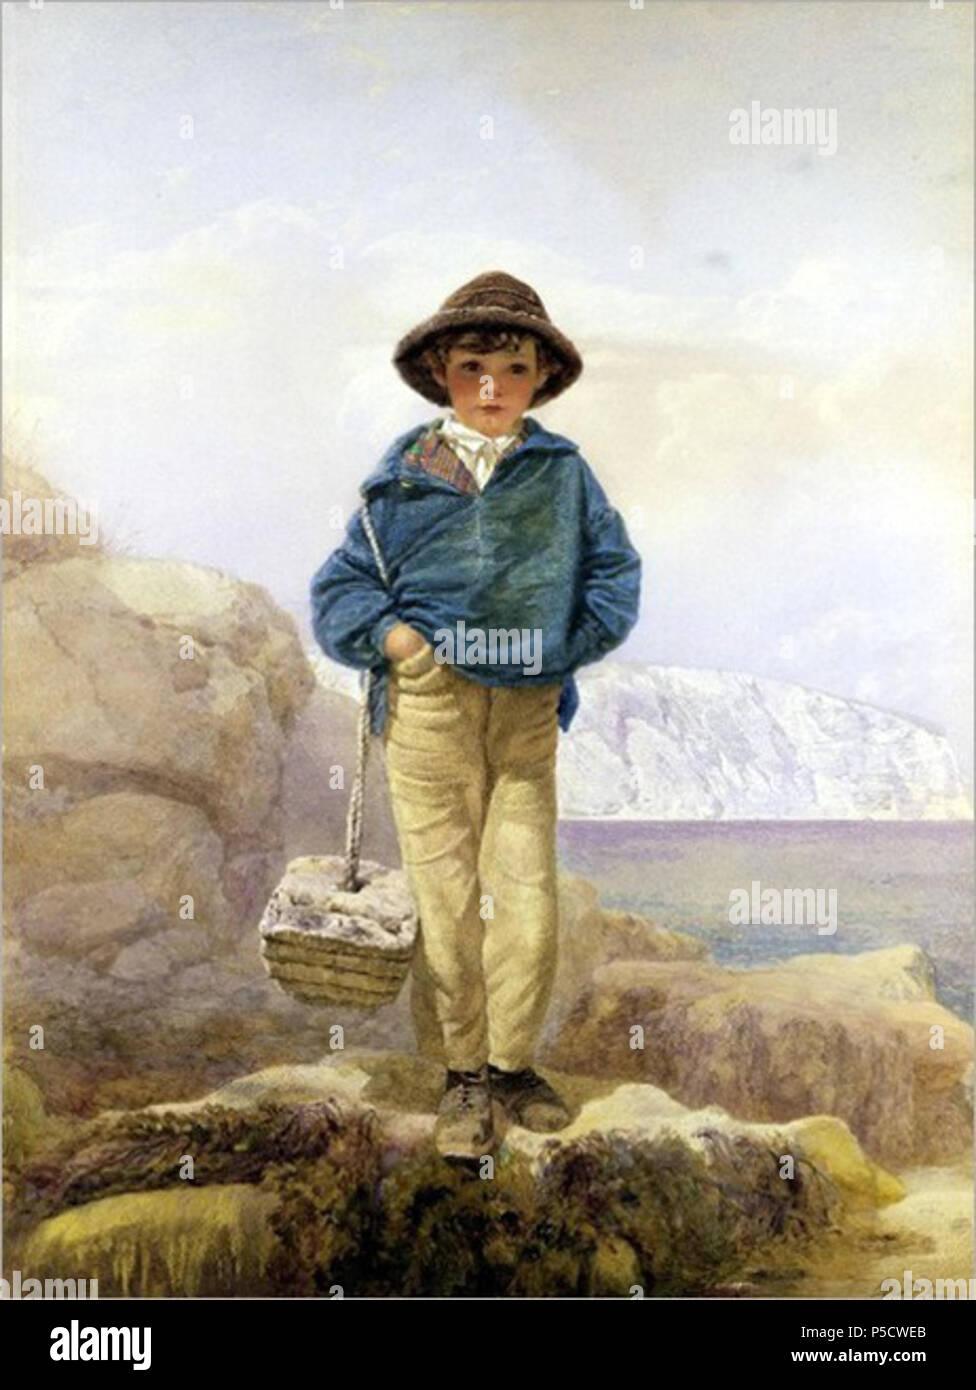 N/A. Un pêcheur garçon . Date inconnue. Alfred Downing Fripp (1822-1895) 43 Un pêcheur garçon par Alfred Downing Fripp Photo Stock